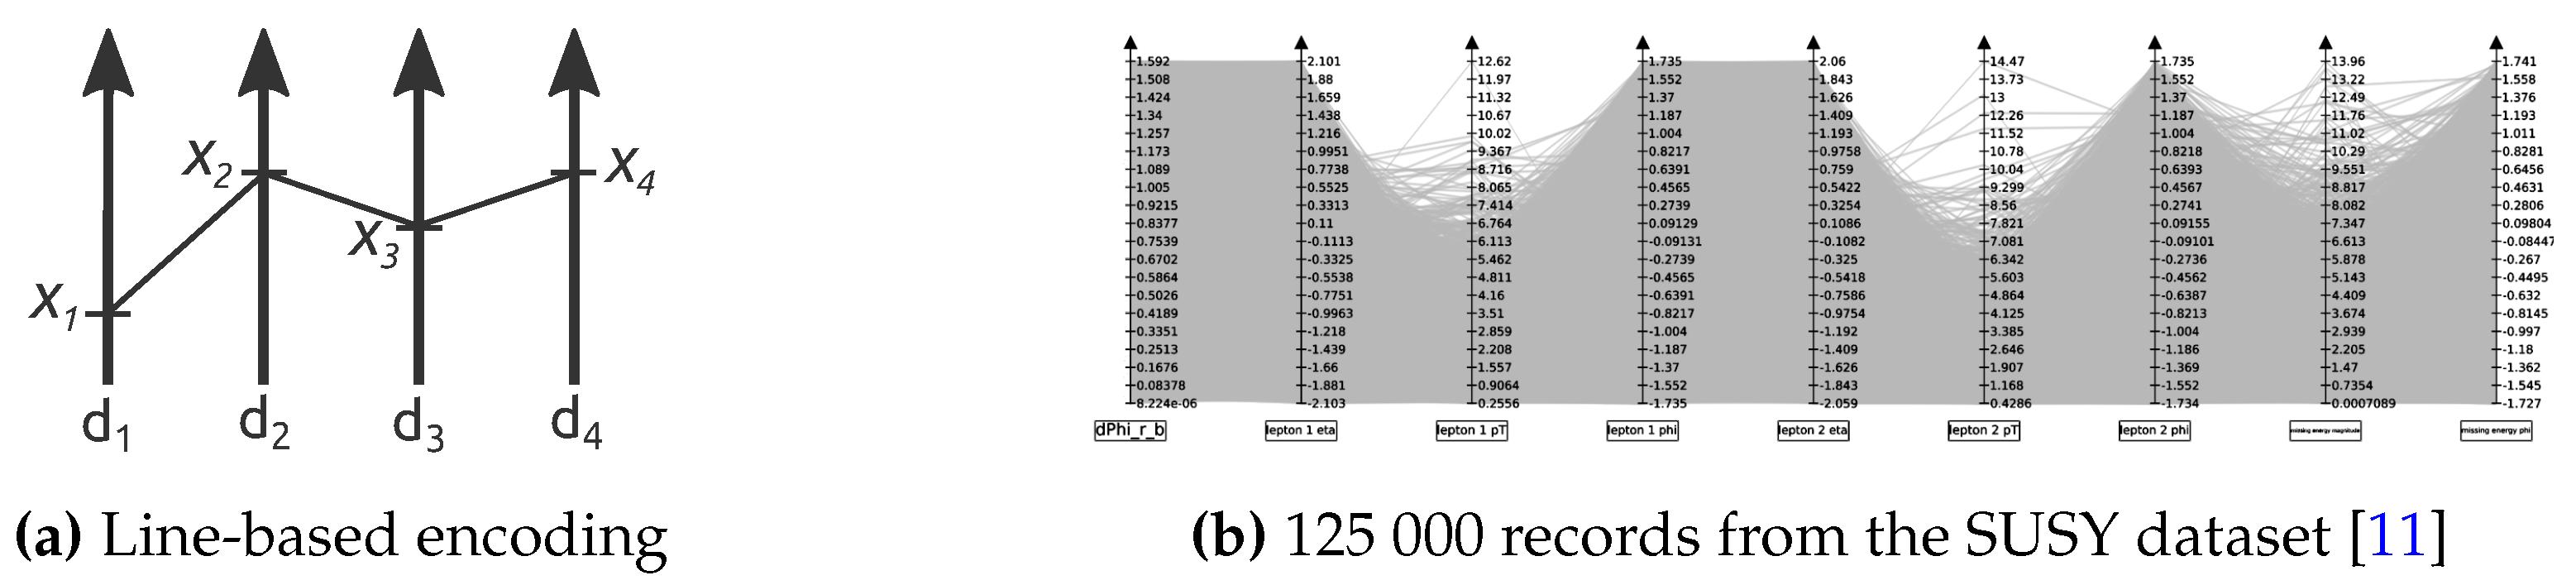 Informatics | Free Full-Text | Visual Exploration of Large